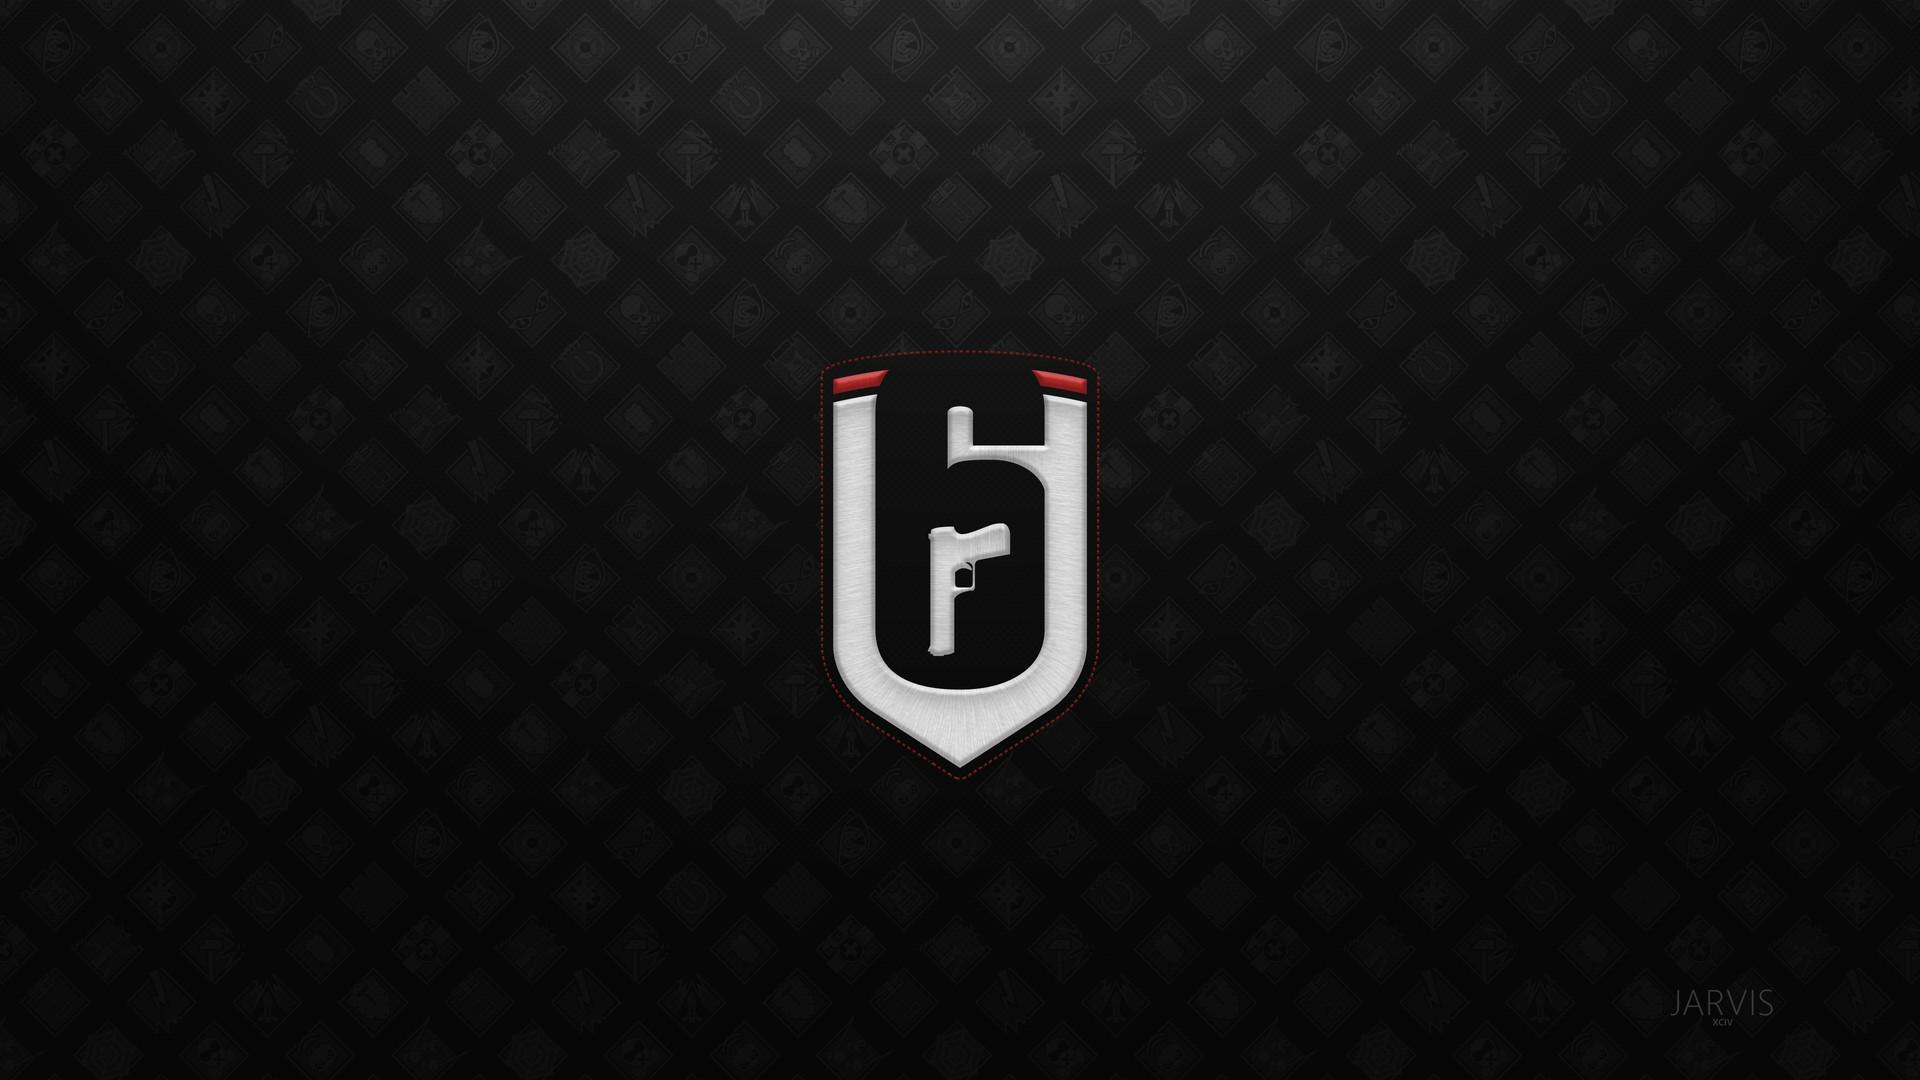 Jarvis Xciv Rainbow Six Siege Logo Wallpaper Pack